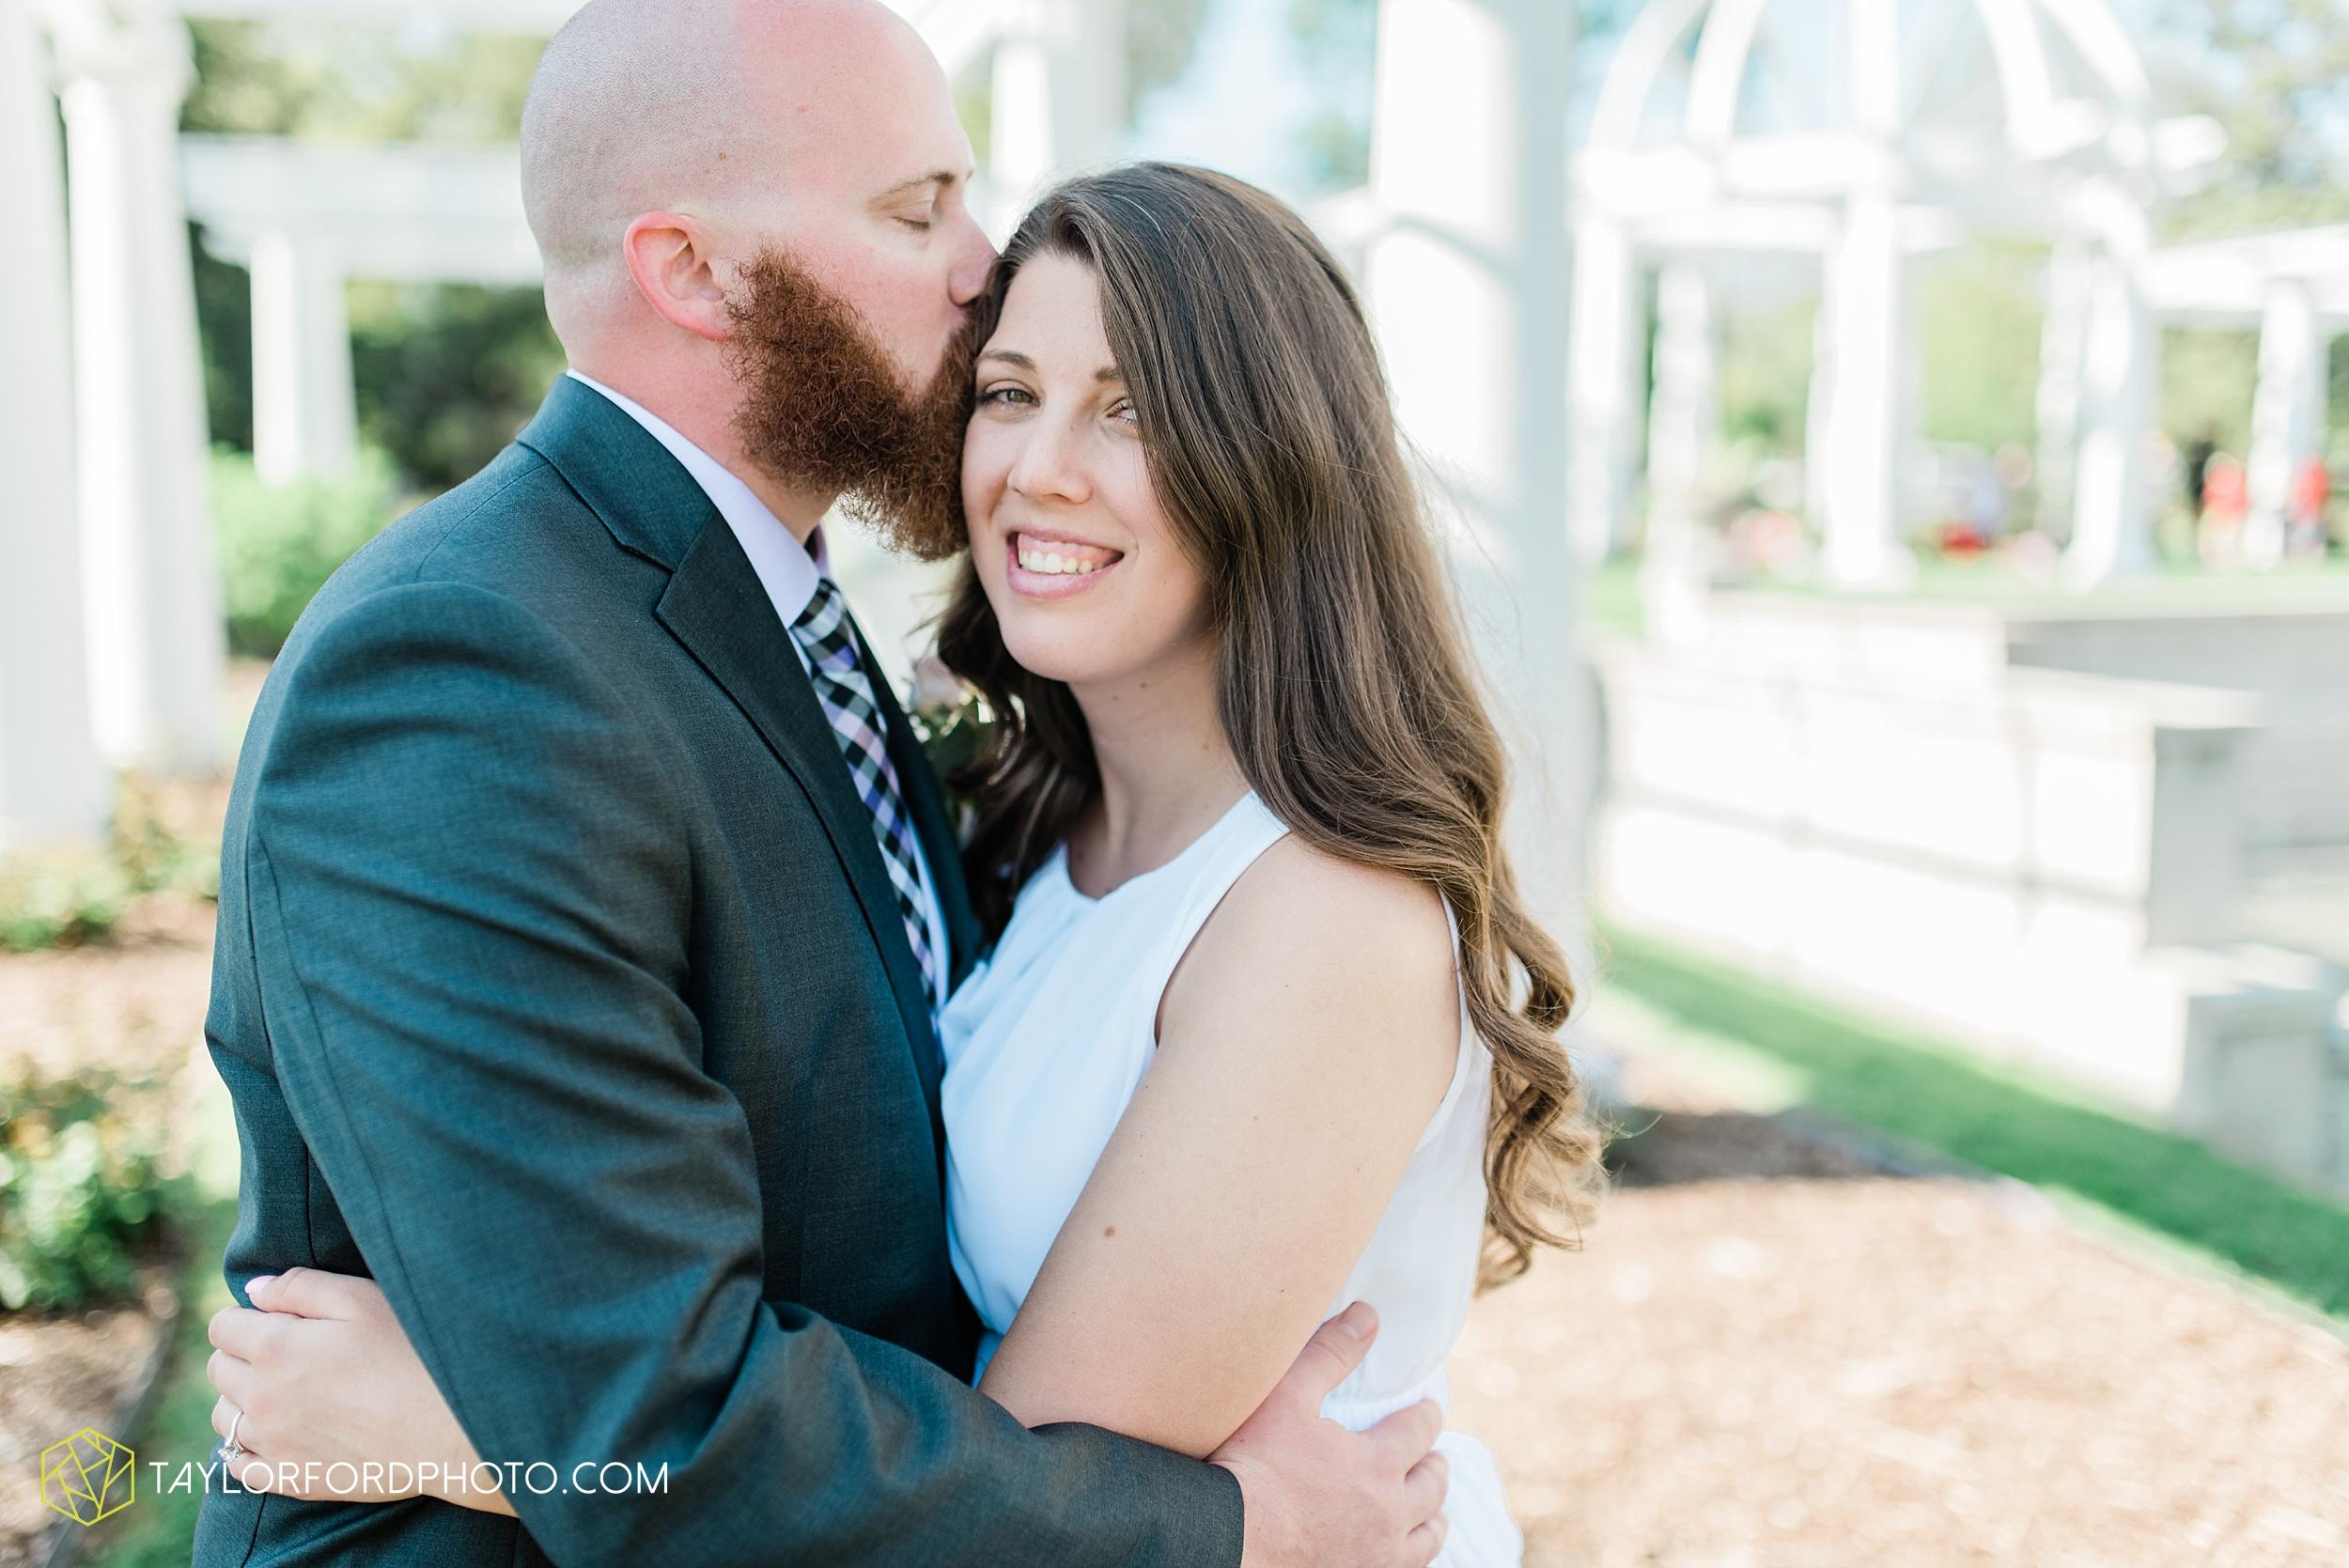 lakeside-rose-gardens-fort-wayne-indiana-elopement-wedding-photographer-Taylor-Ford-Photography_7175.jpg